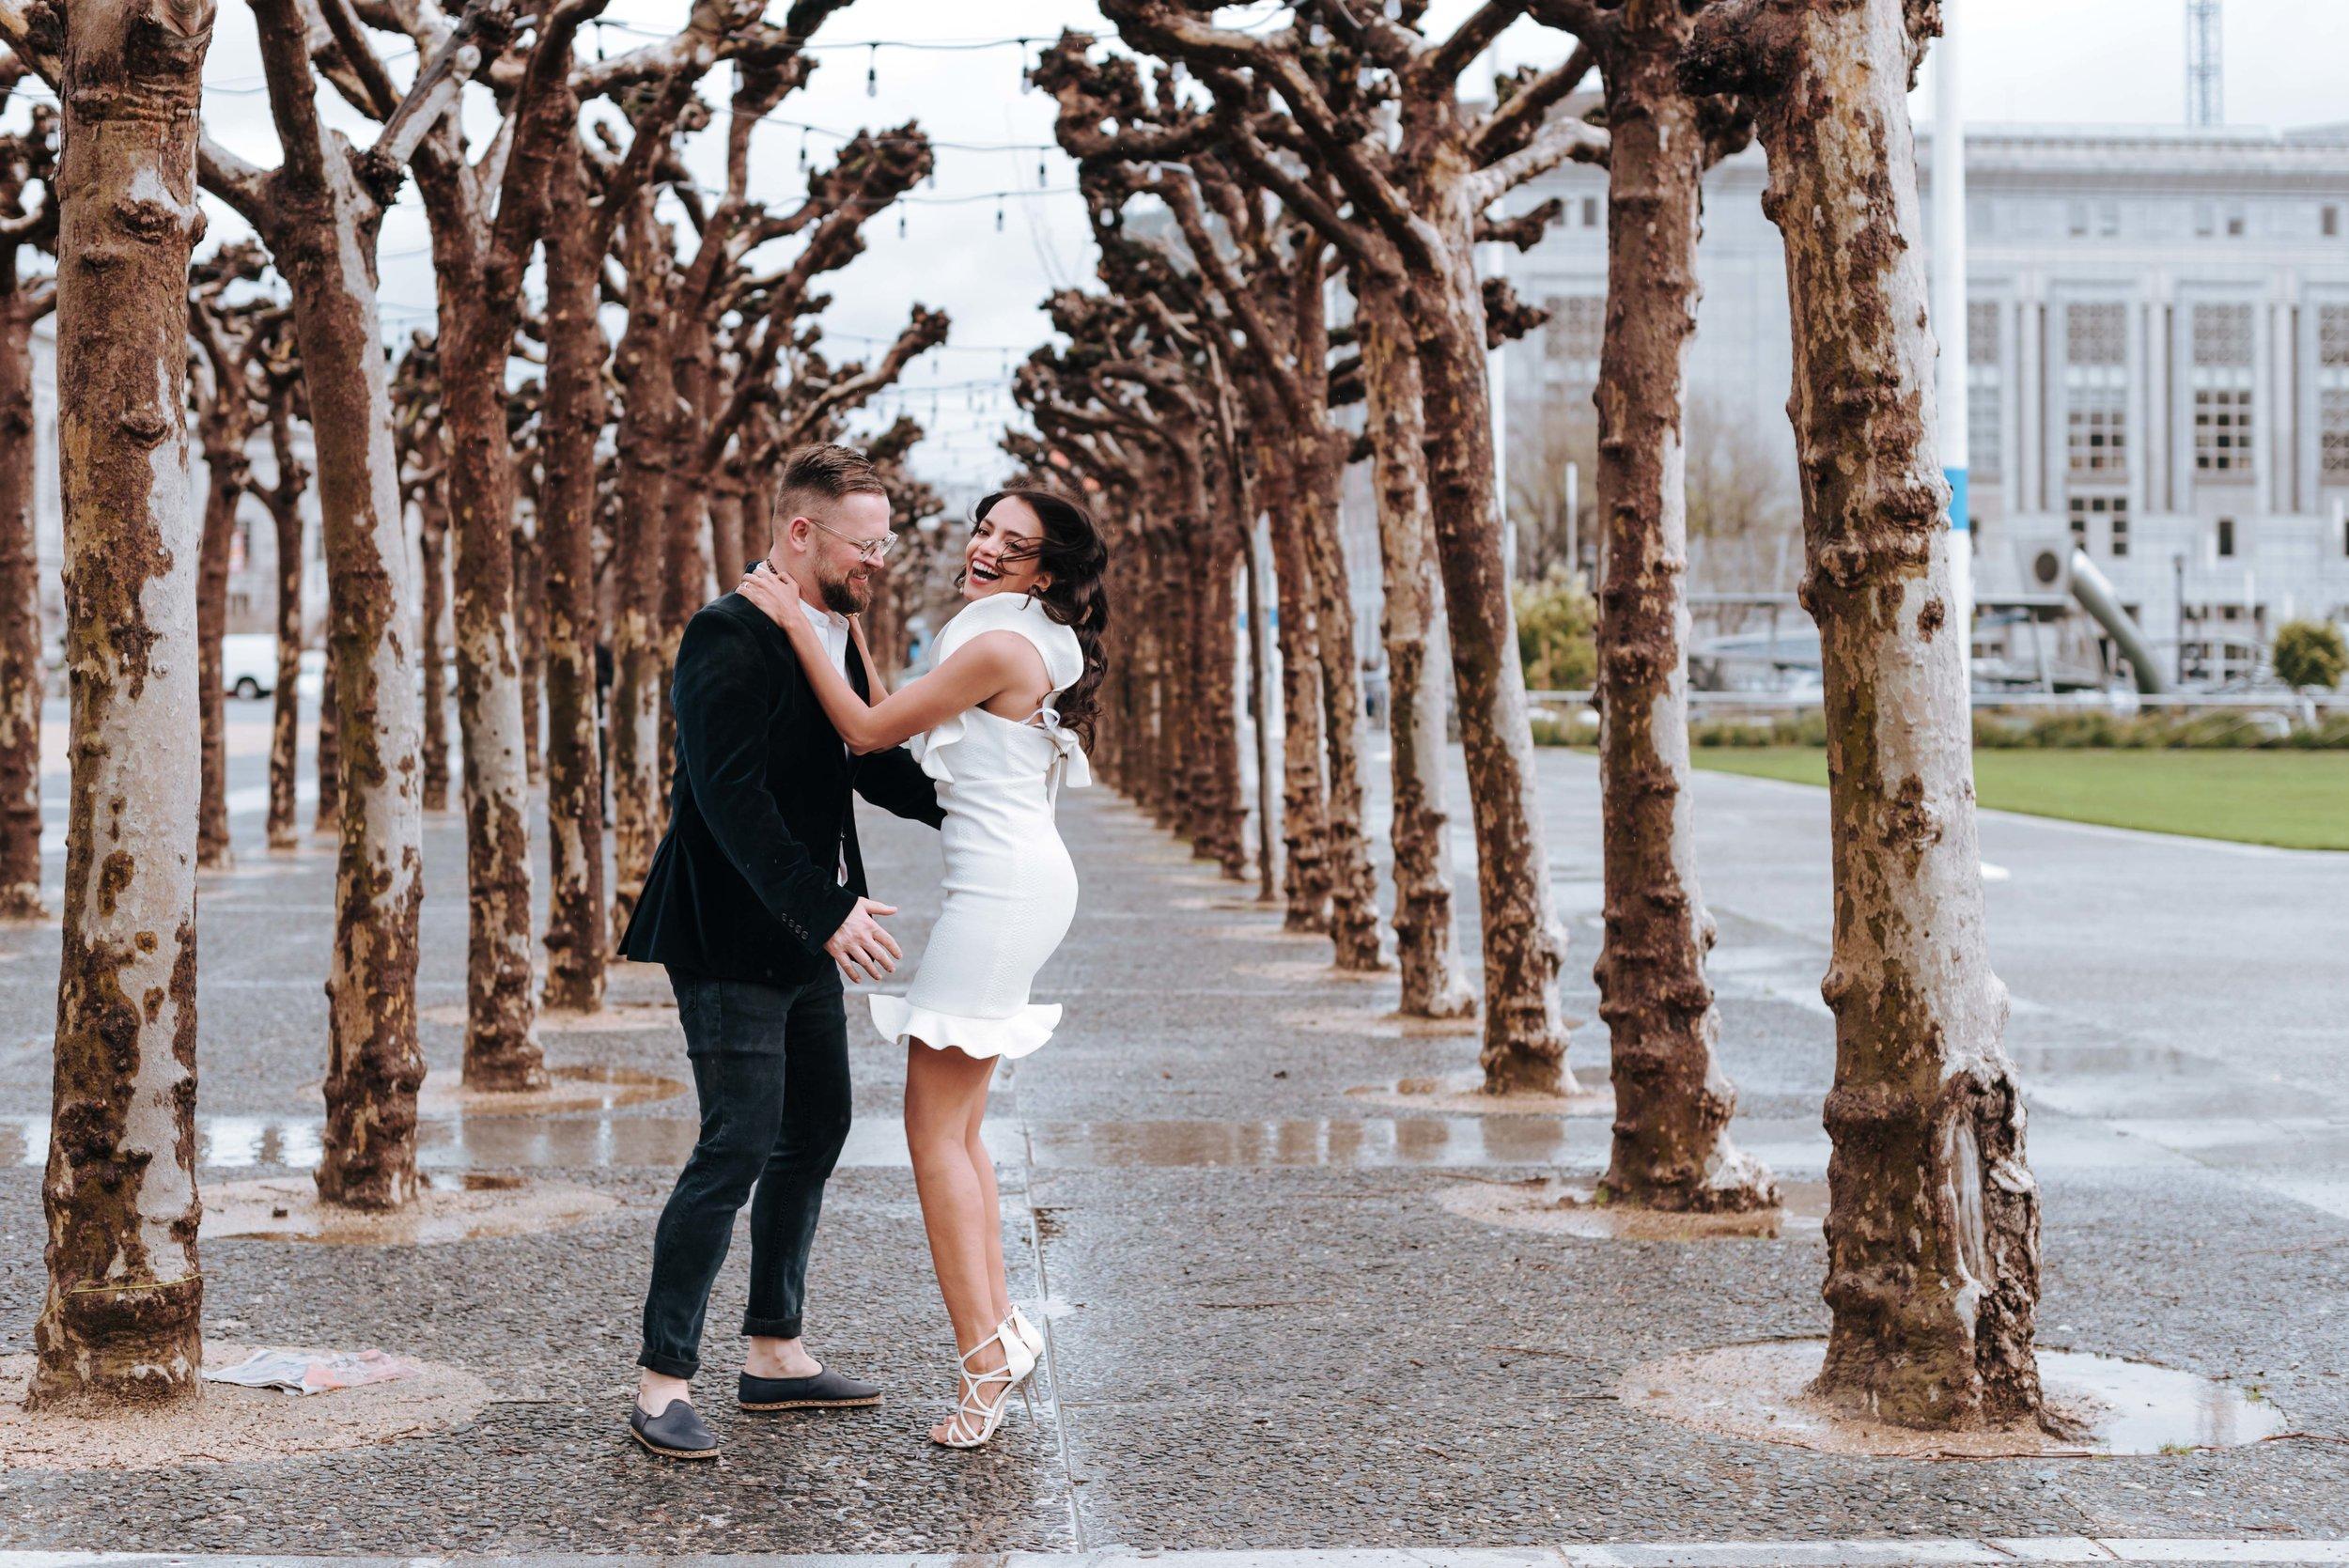 A rainy day elopement at San Francisco City Hall